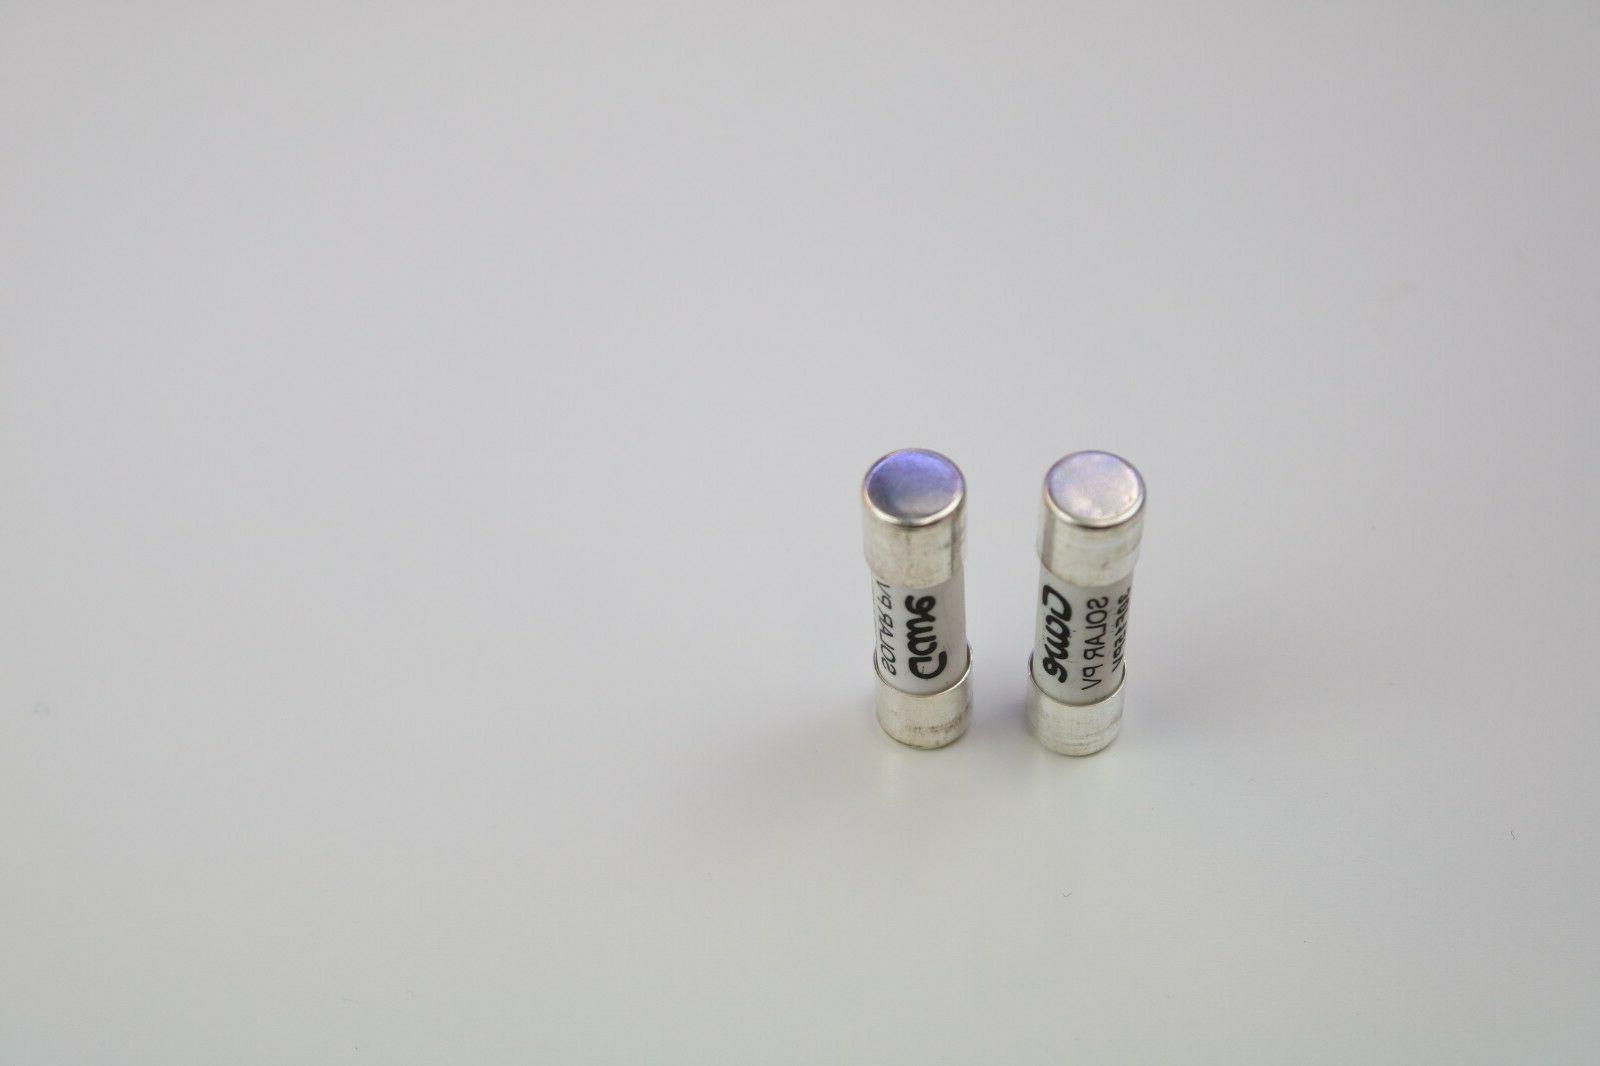 Solar PV 15A DC up tp 1000Vdc pair